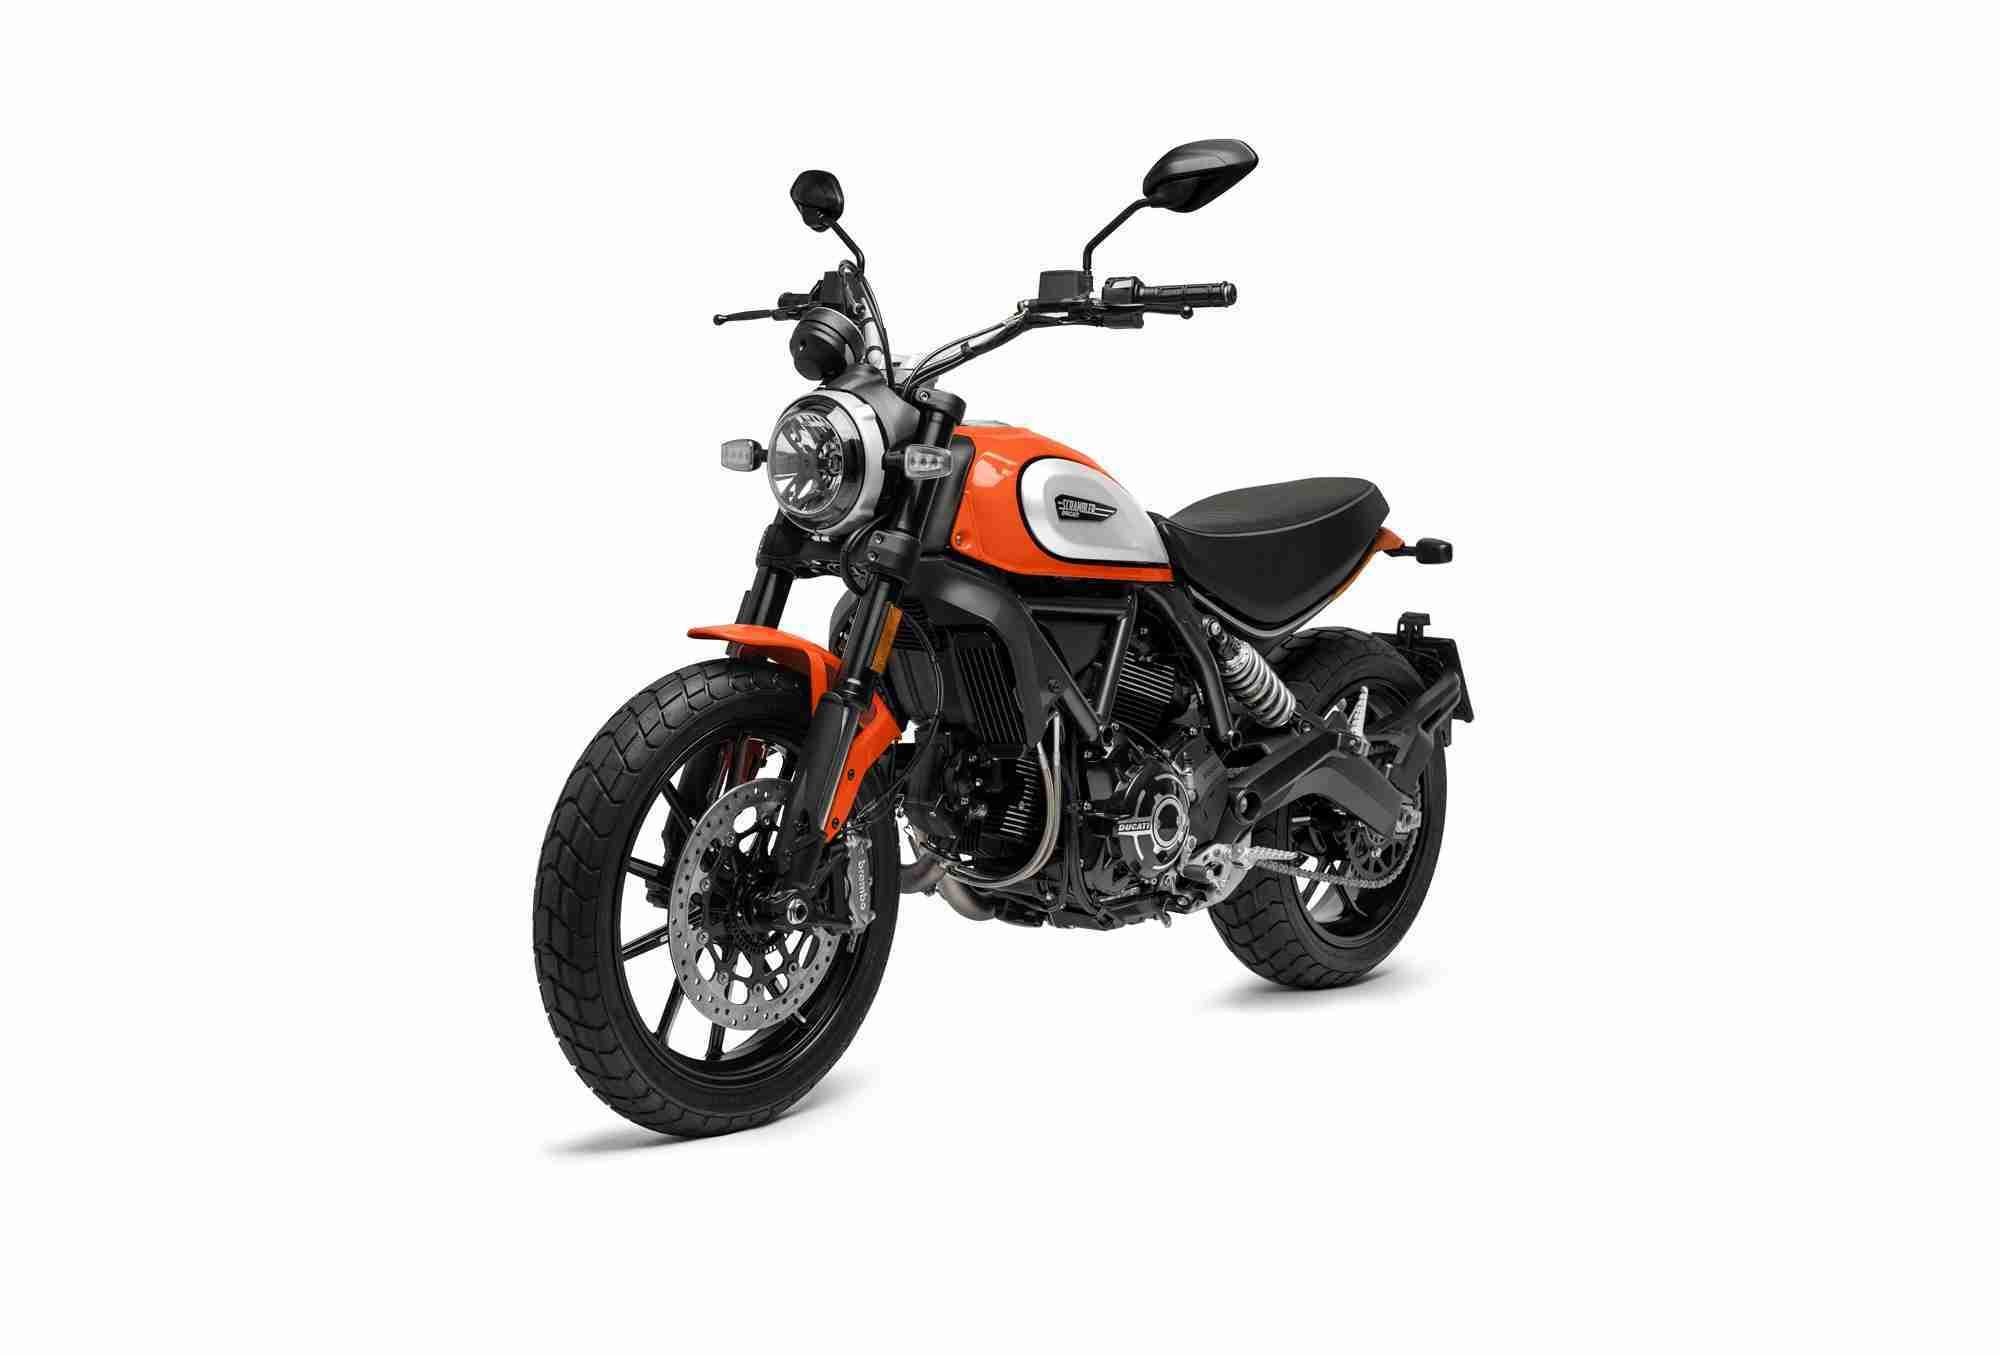 2019 Ducati Scrambler Ambience HD wallpaper